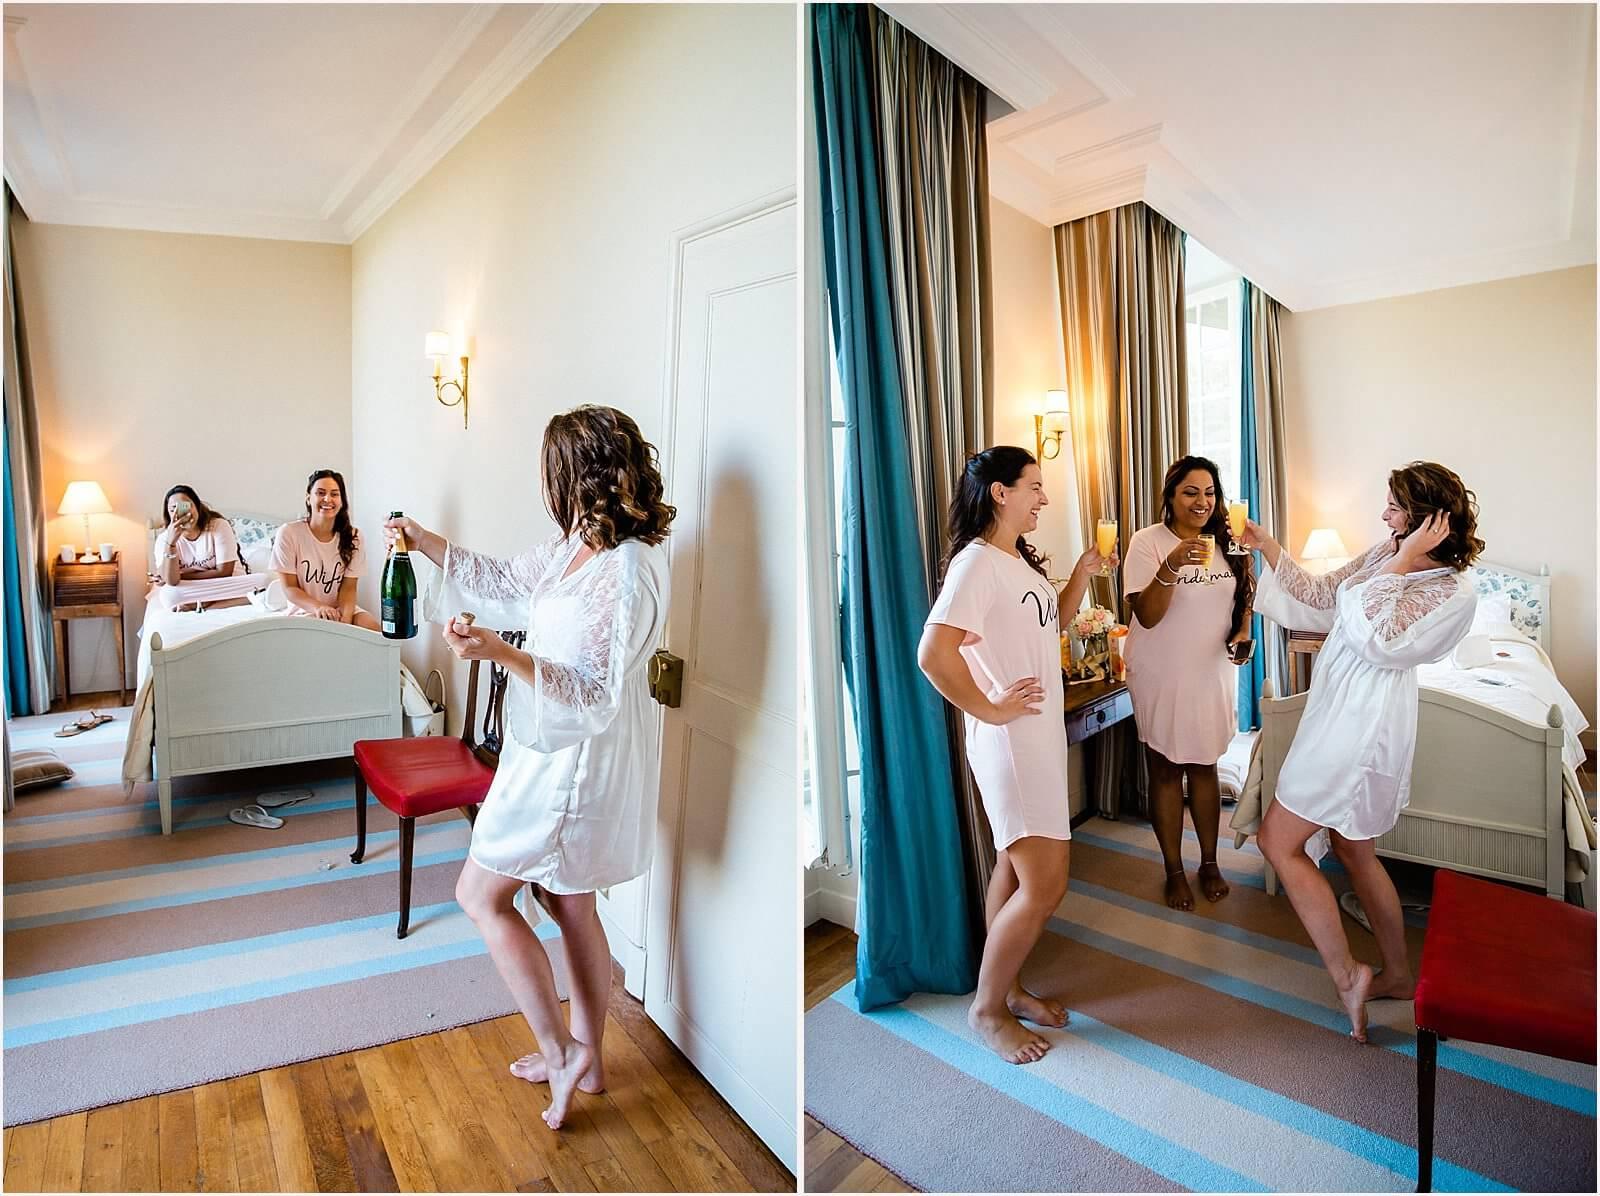 Chateau de Courtomer Wedding | Chantel & Evan 2